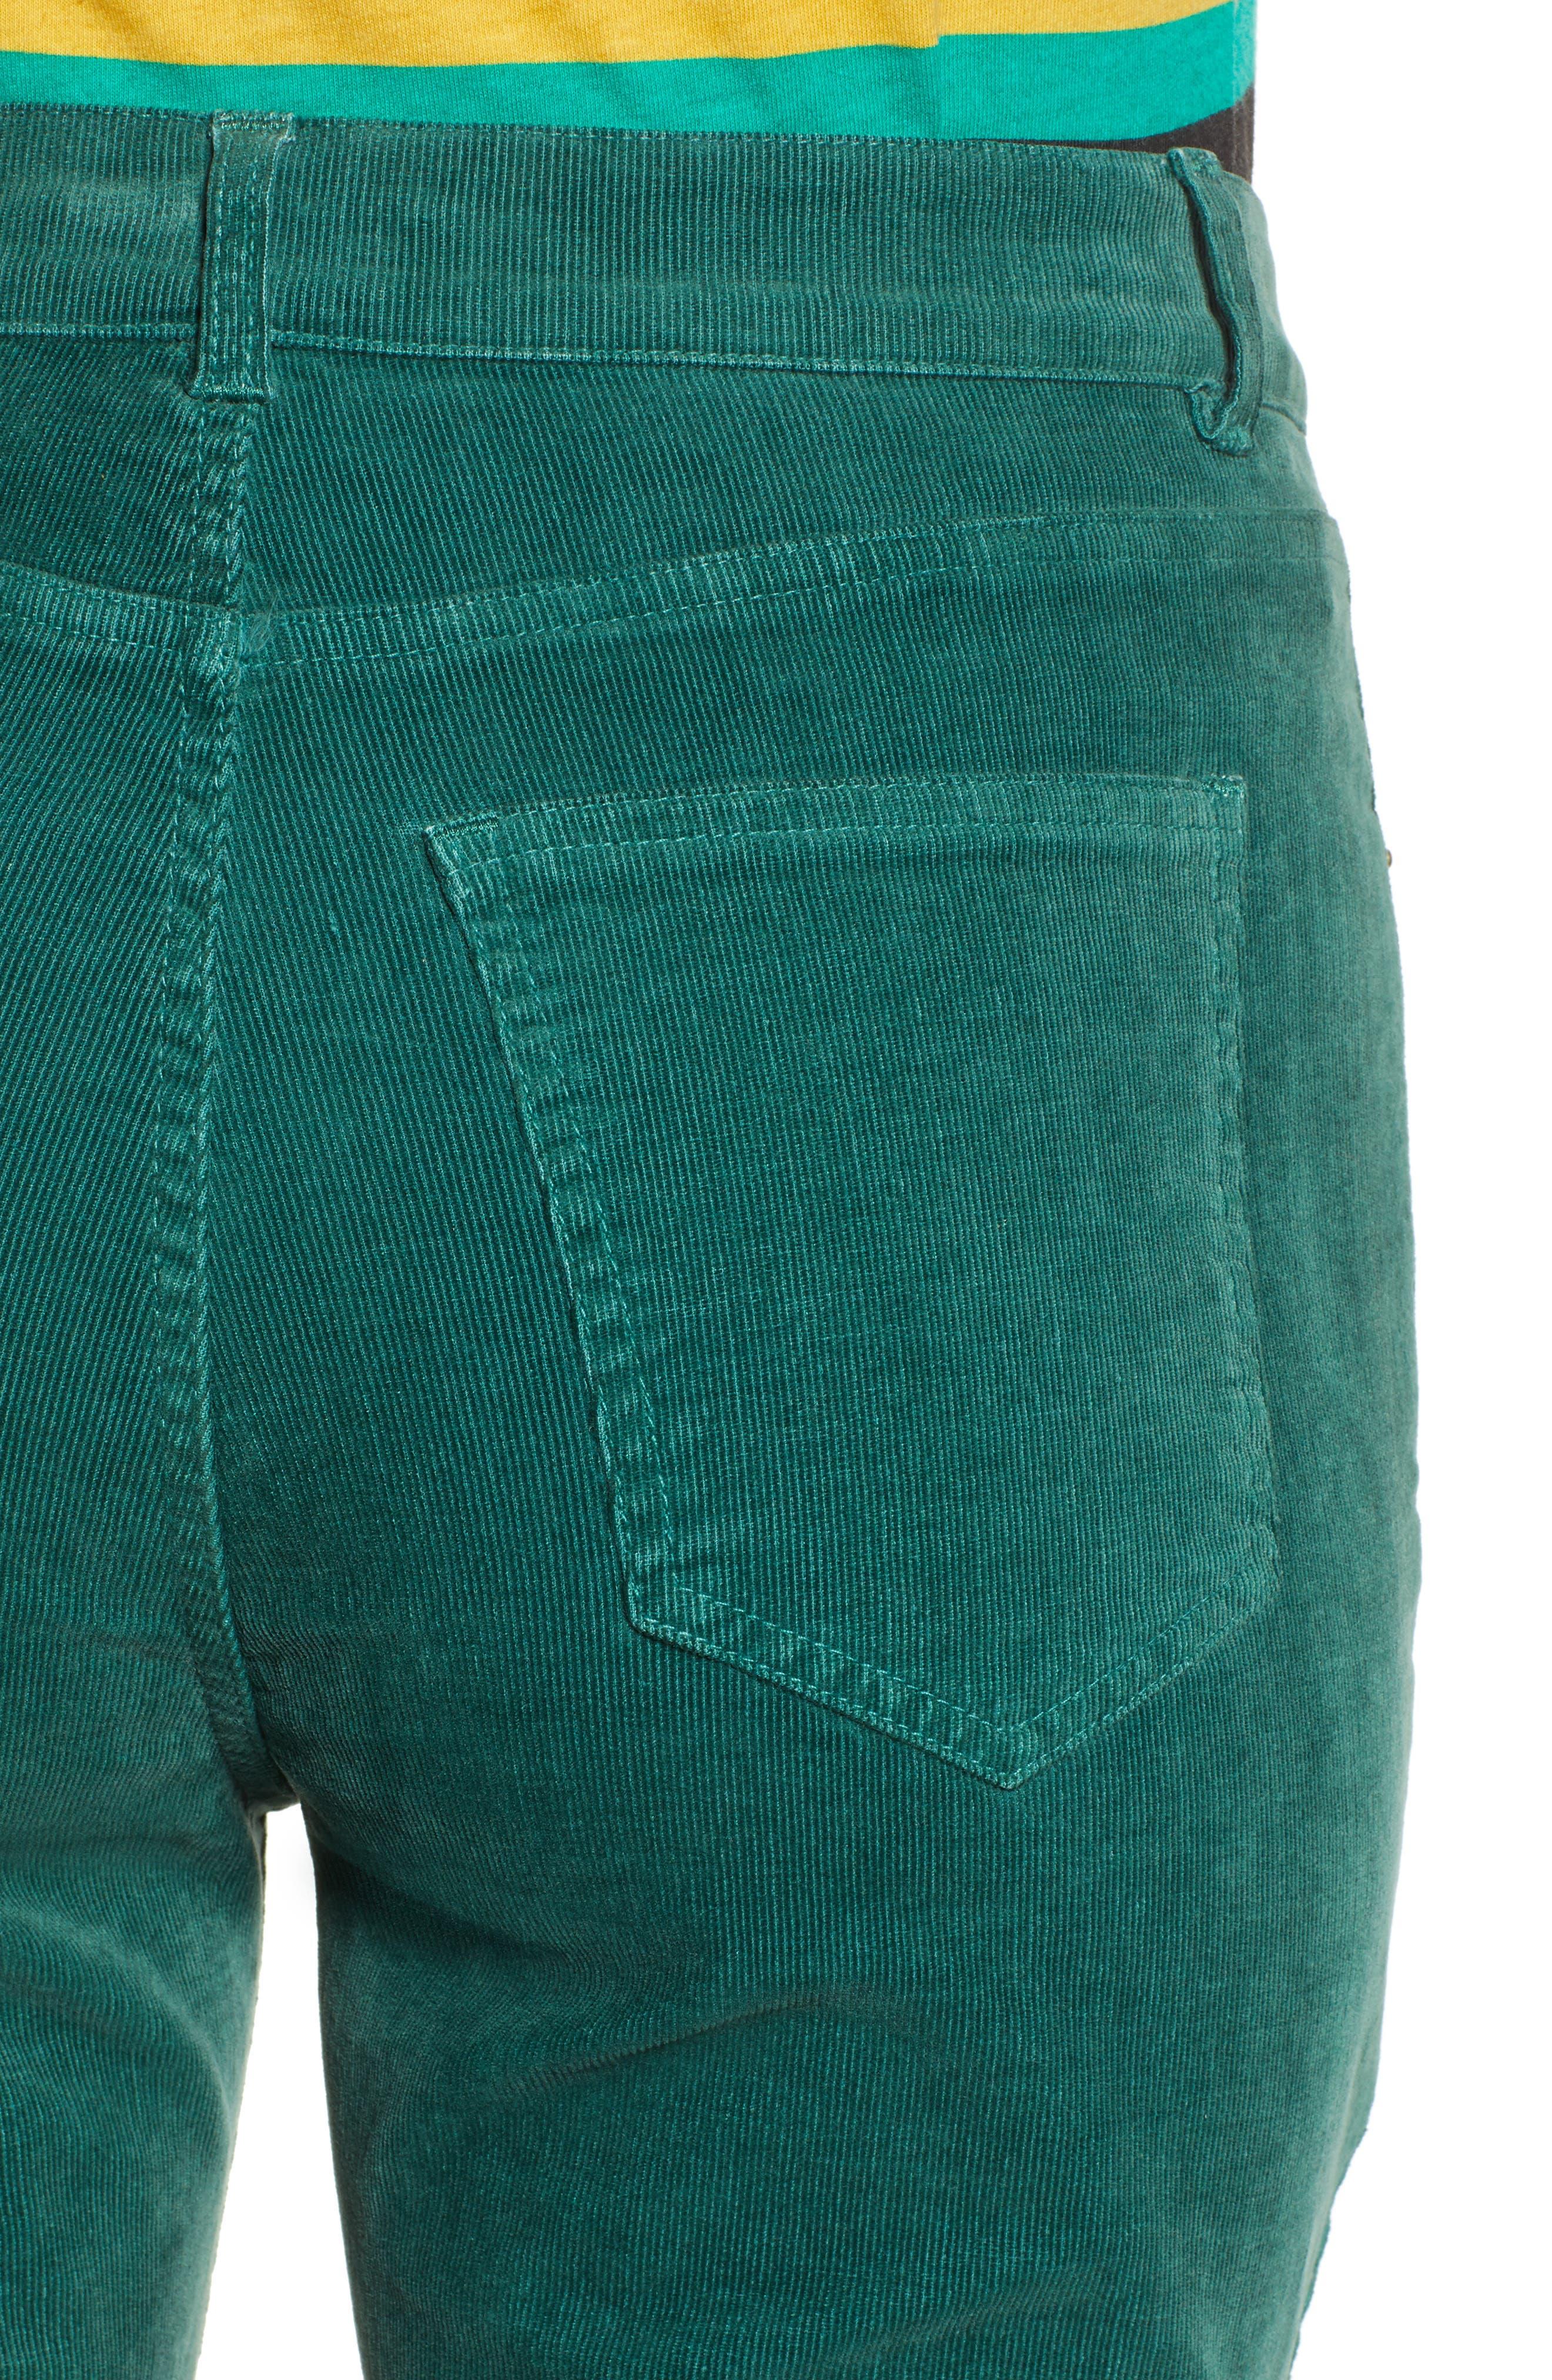 Crop Flare Pants,                             Alternate thumbnail 4, color,                             EMERALD